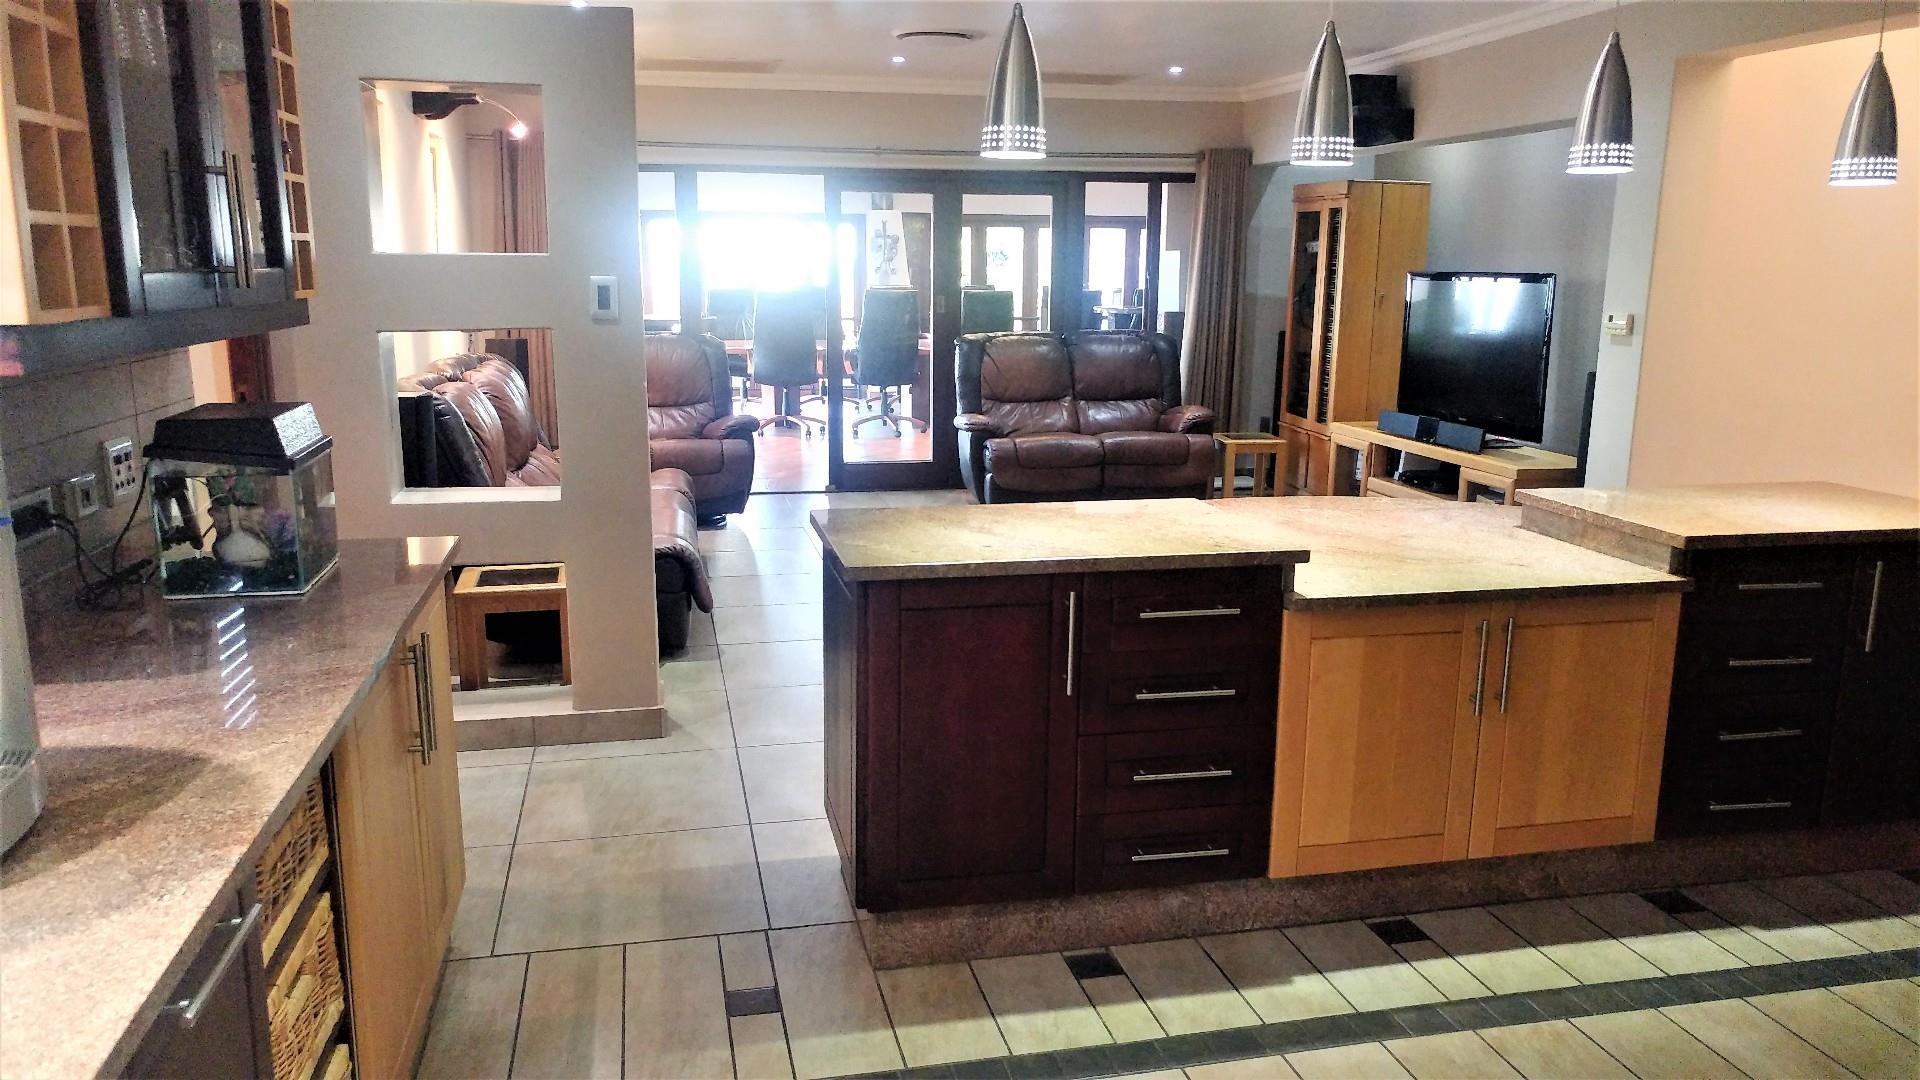 5 Bedroom House For Sale in Shandon Estate